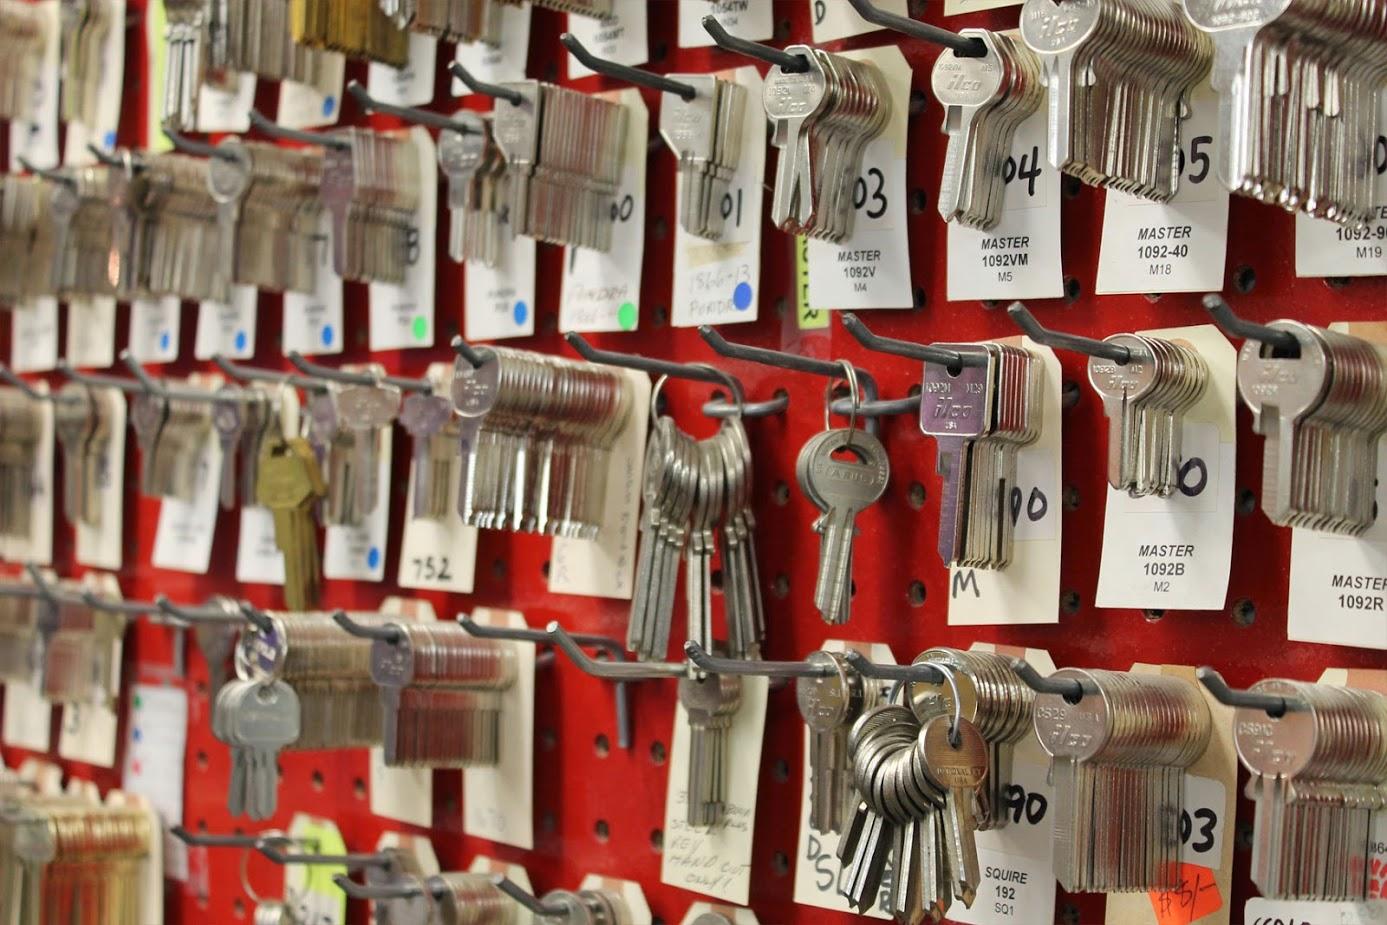 Locksmith key wall